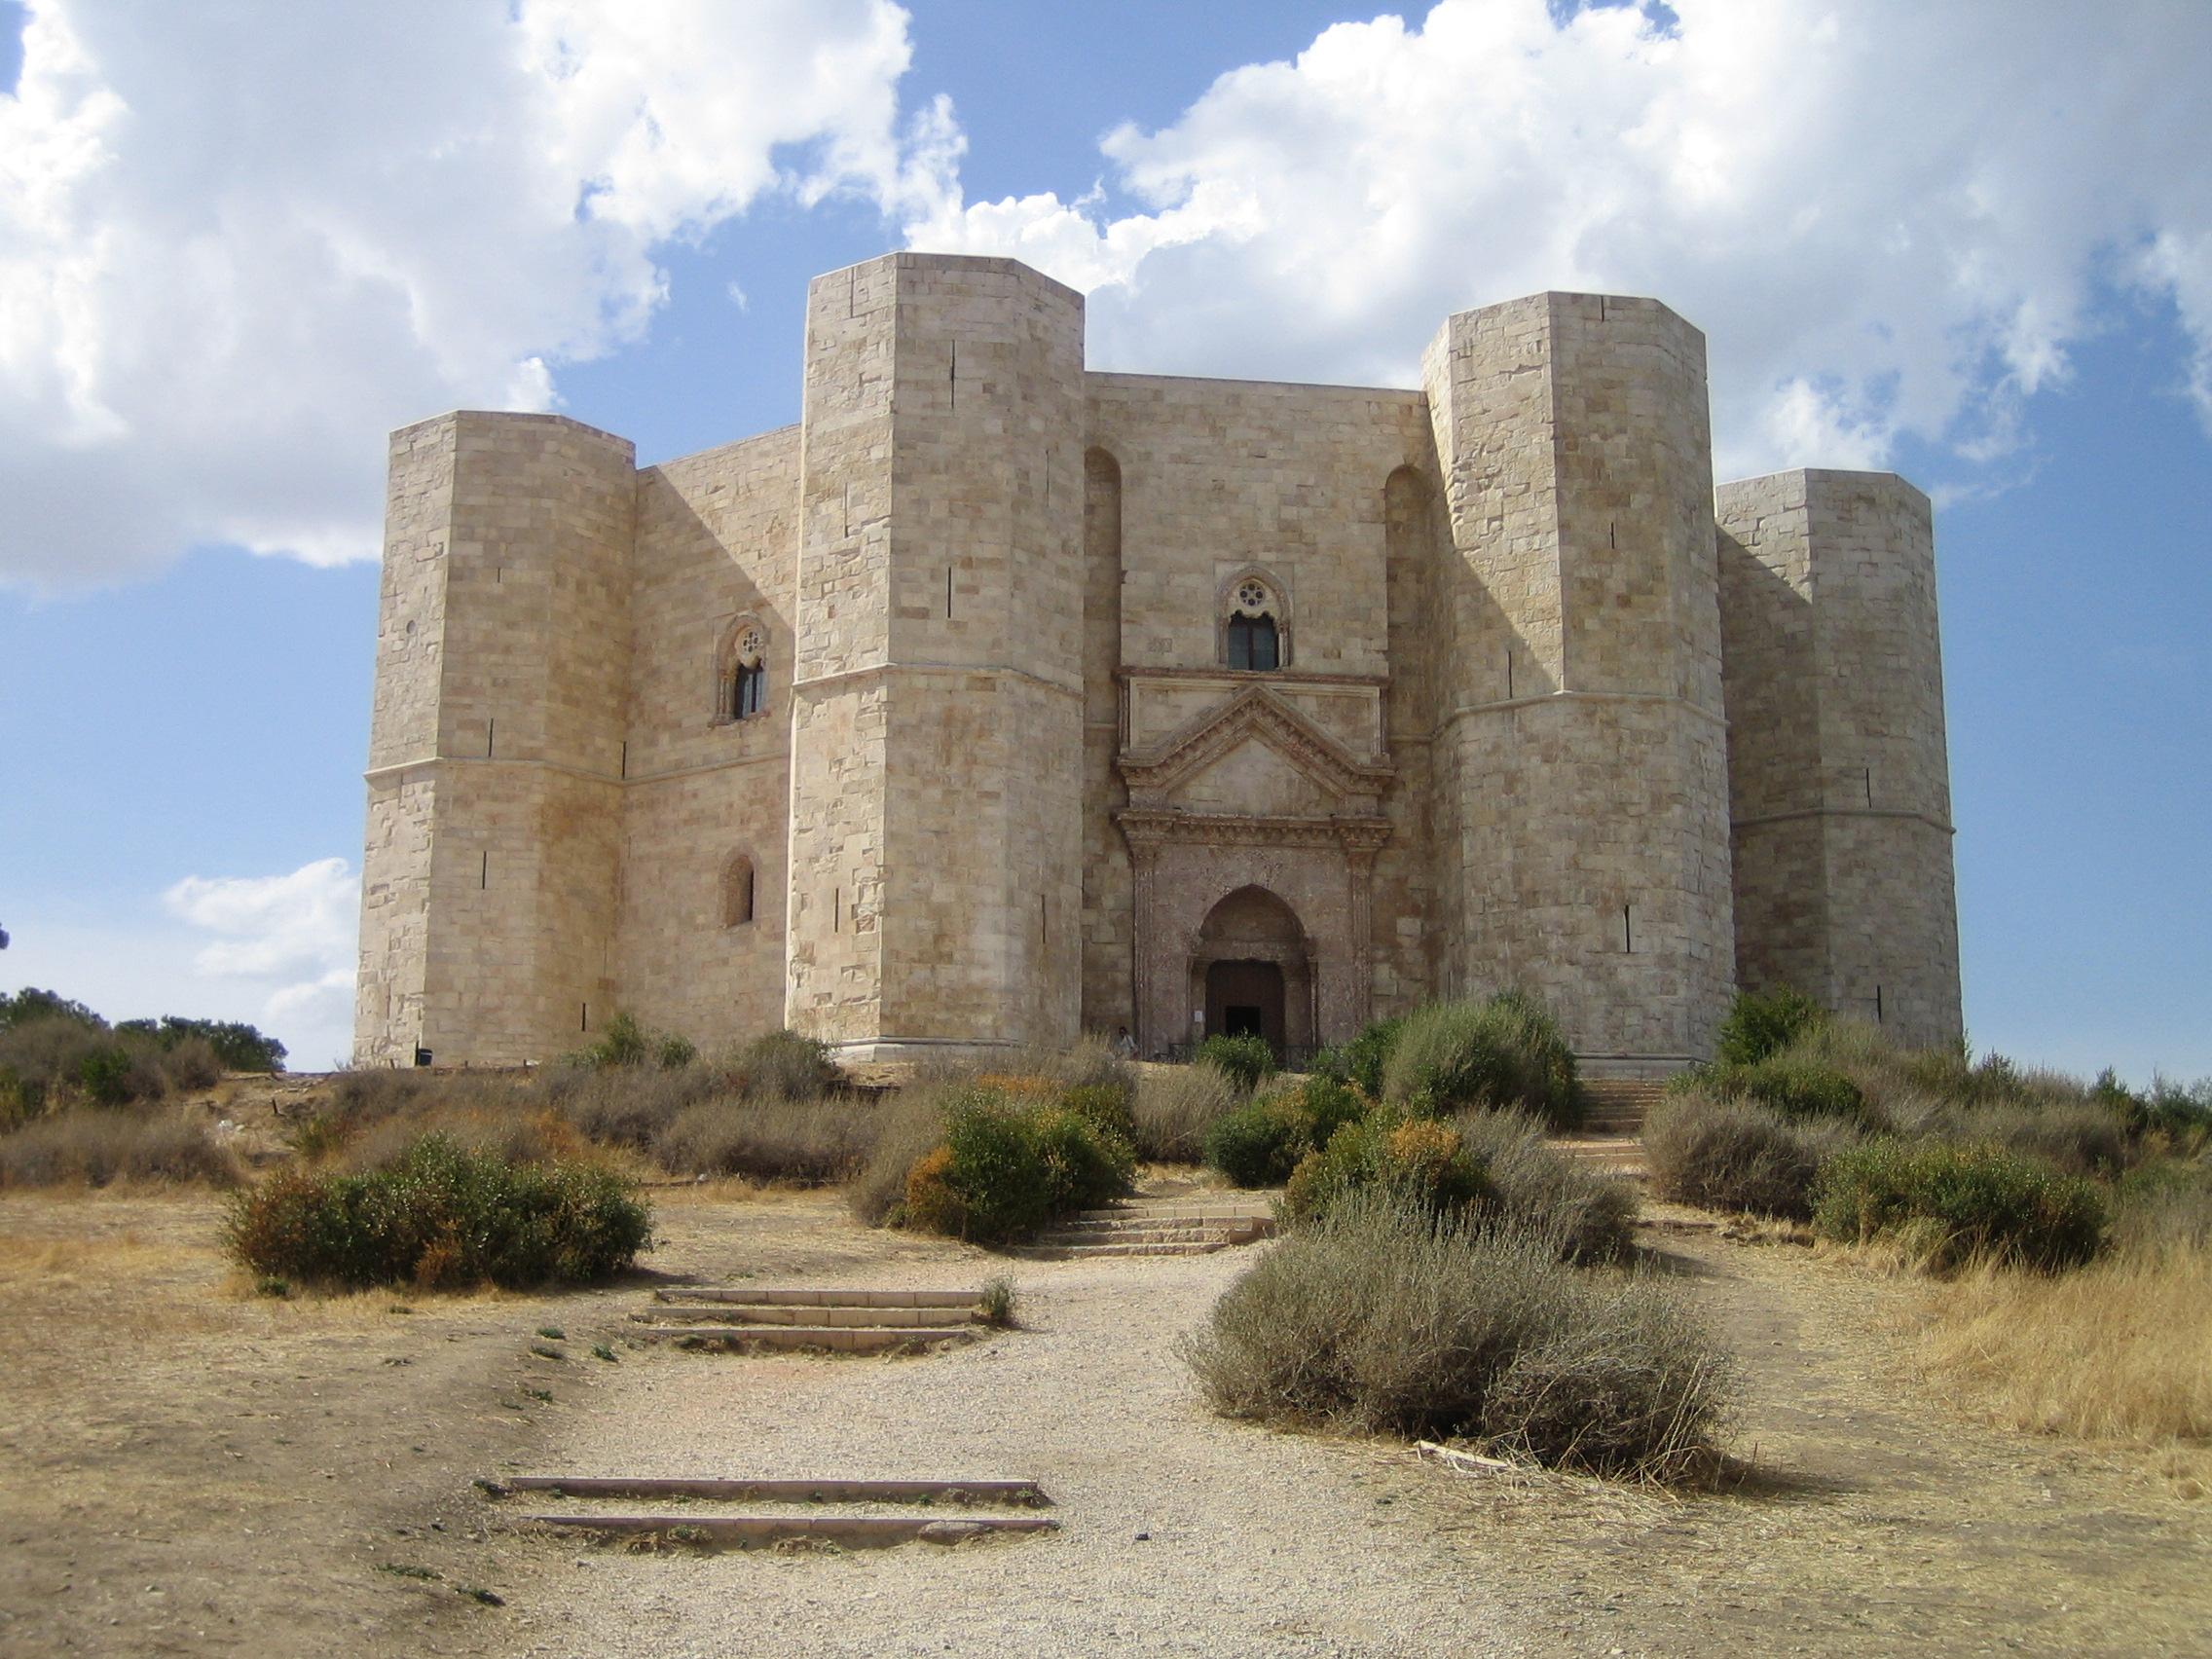 castel del monte - photo #17